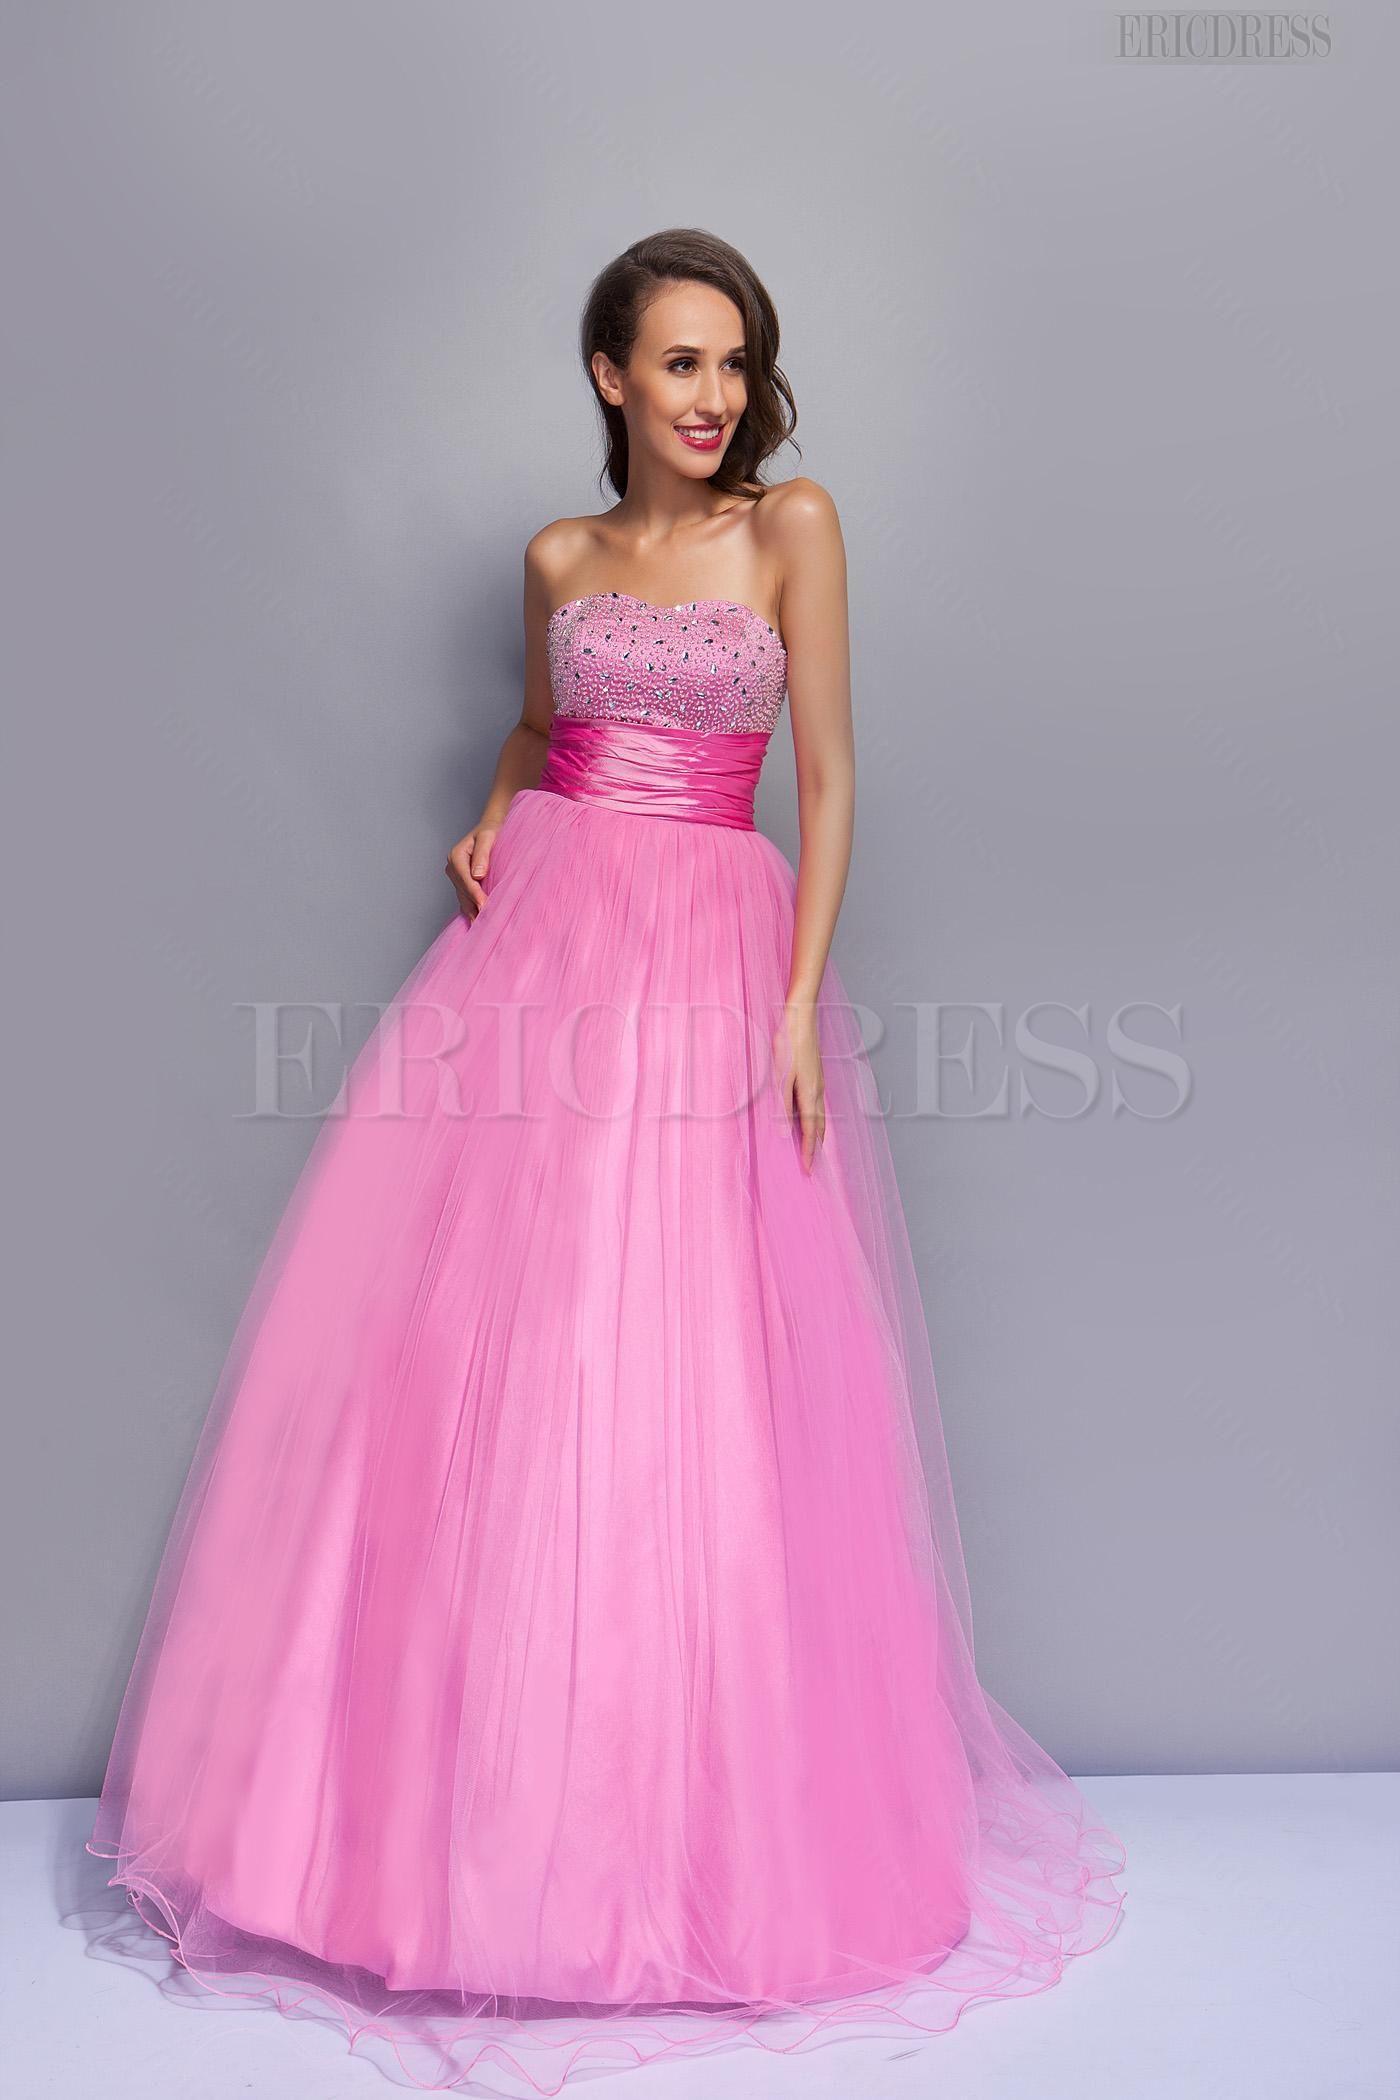 Fantastic aline sweetheart floorlength beading renataus prom dress